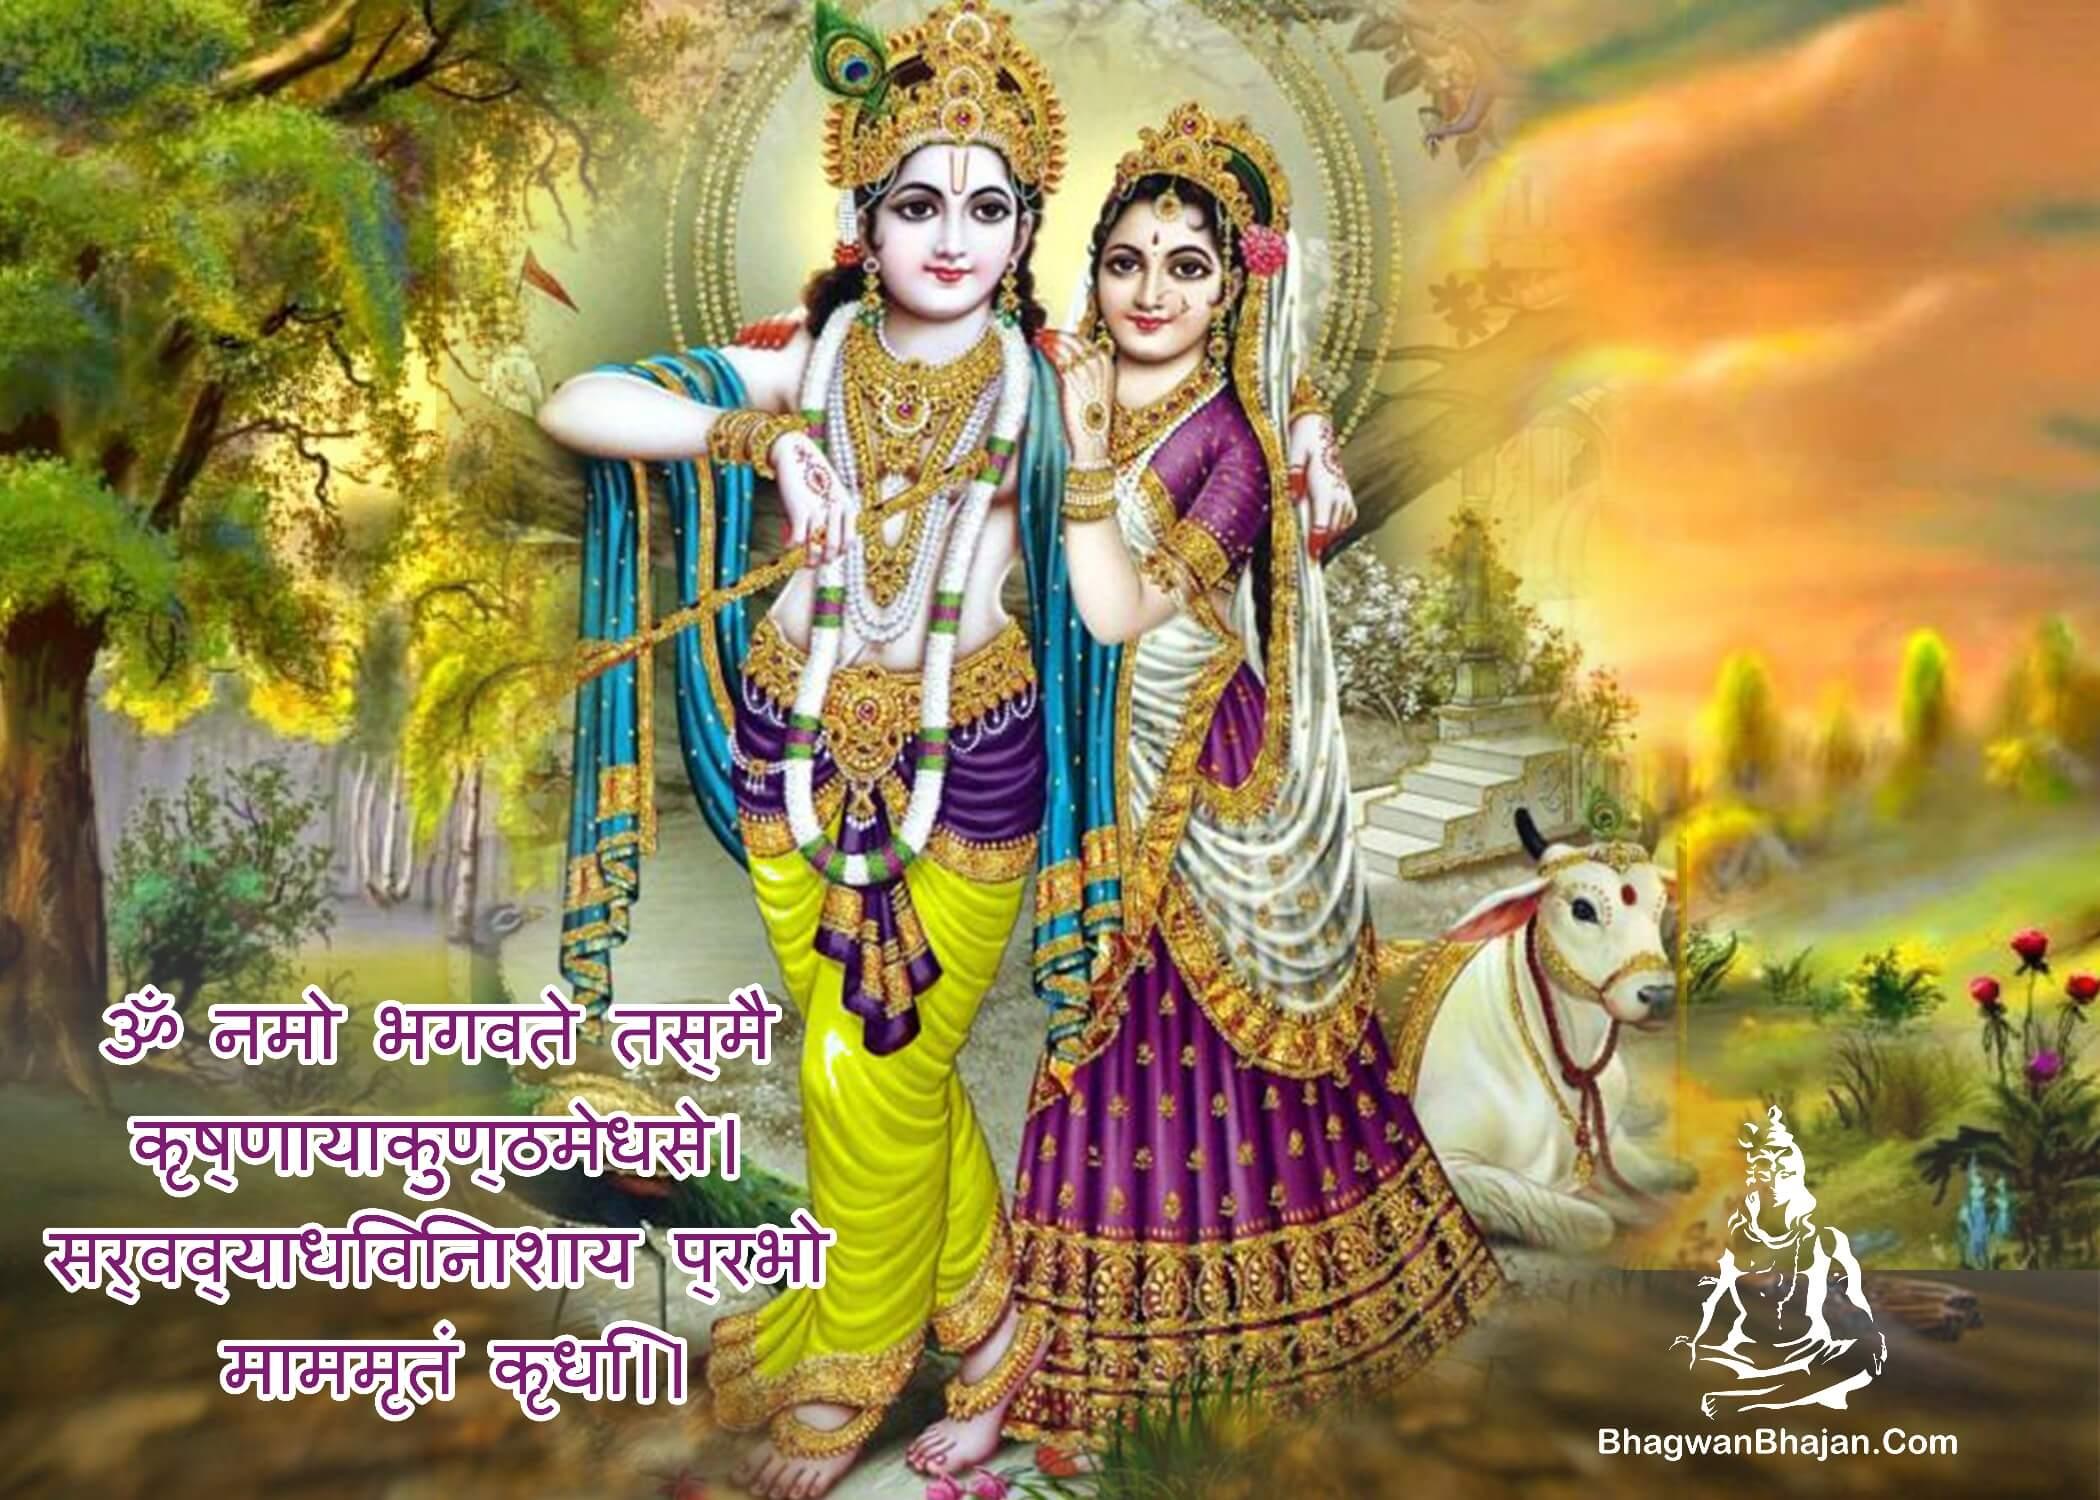 bhagwan shri krishna om namah bhagawate wallpaper